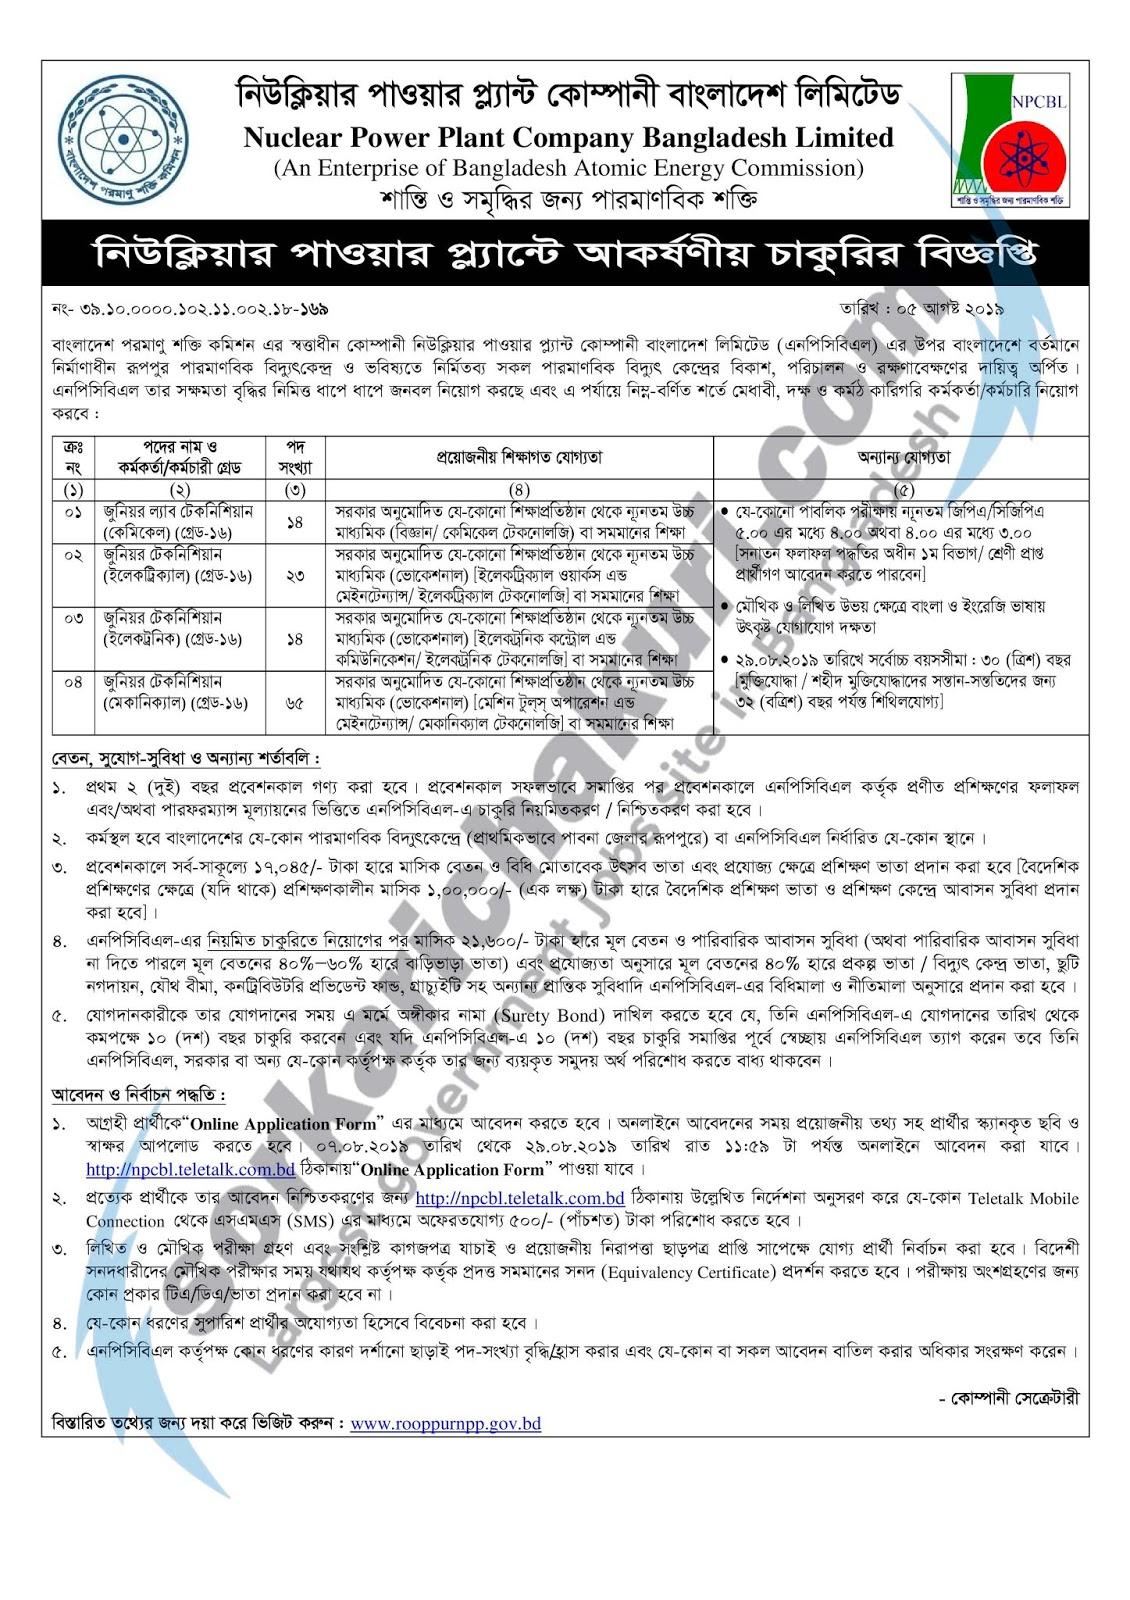 Nuclear Power Plant Company Bangladesh Limited Jobs Circular 2019